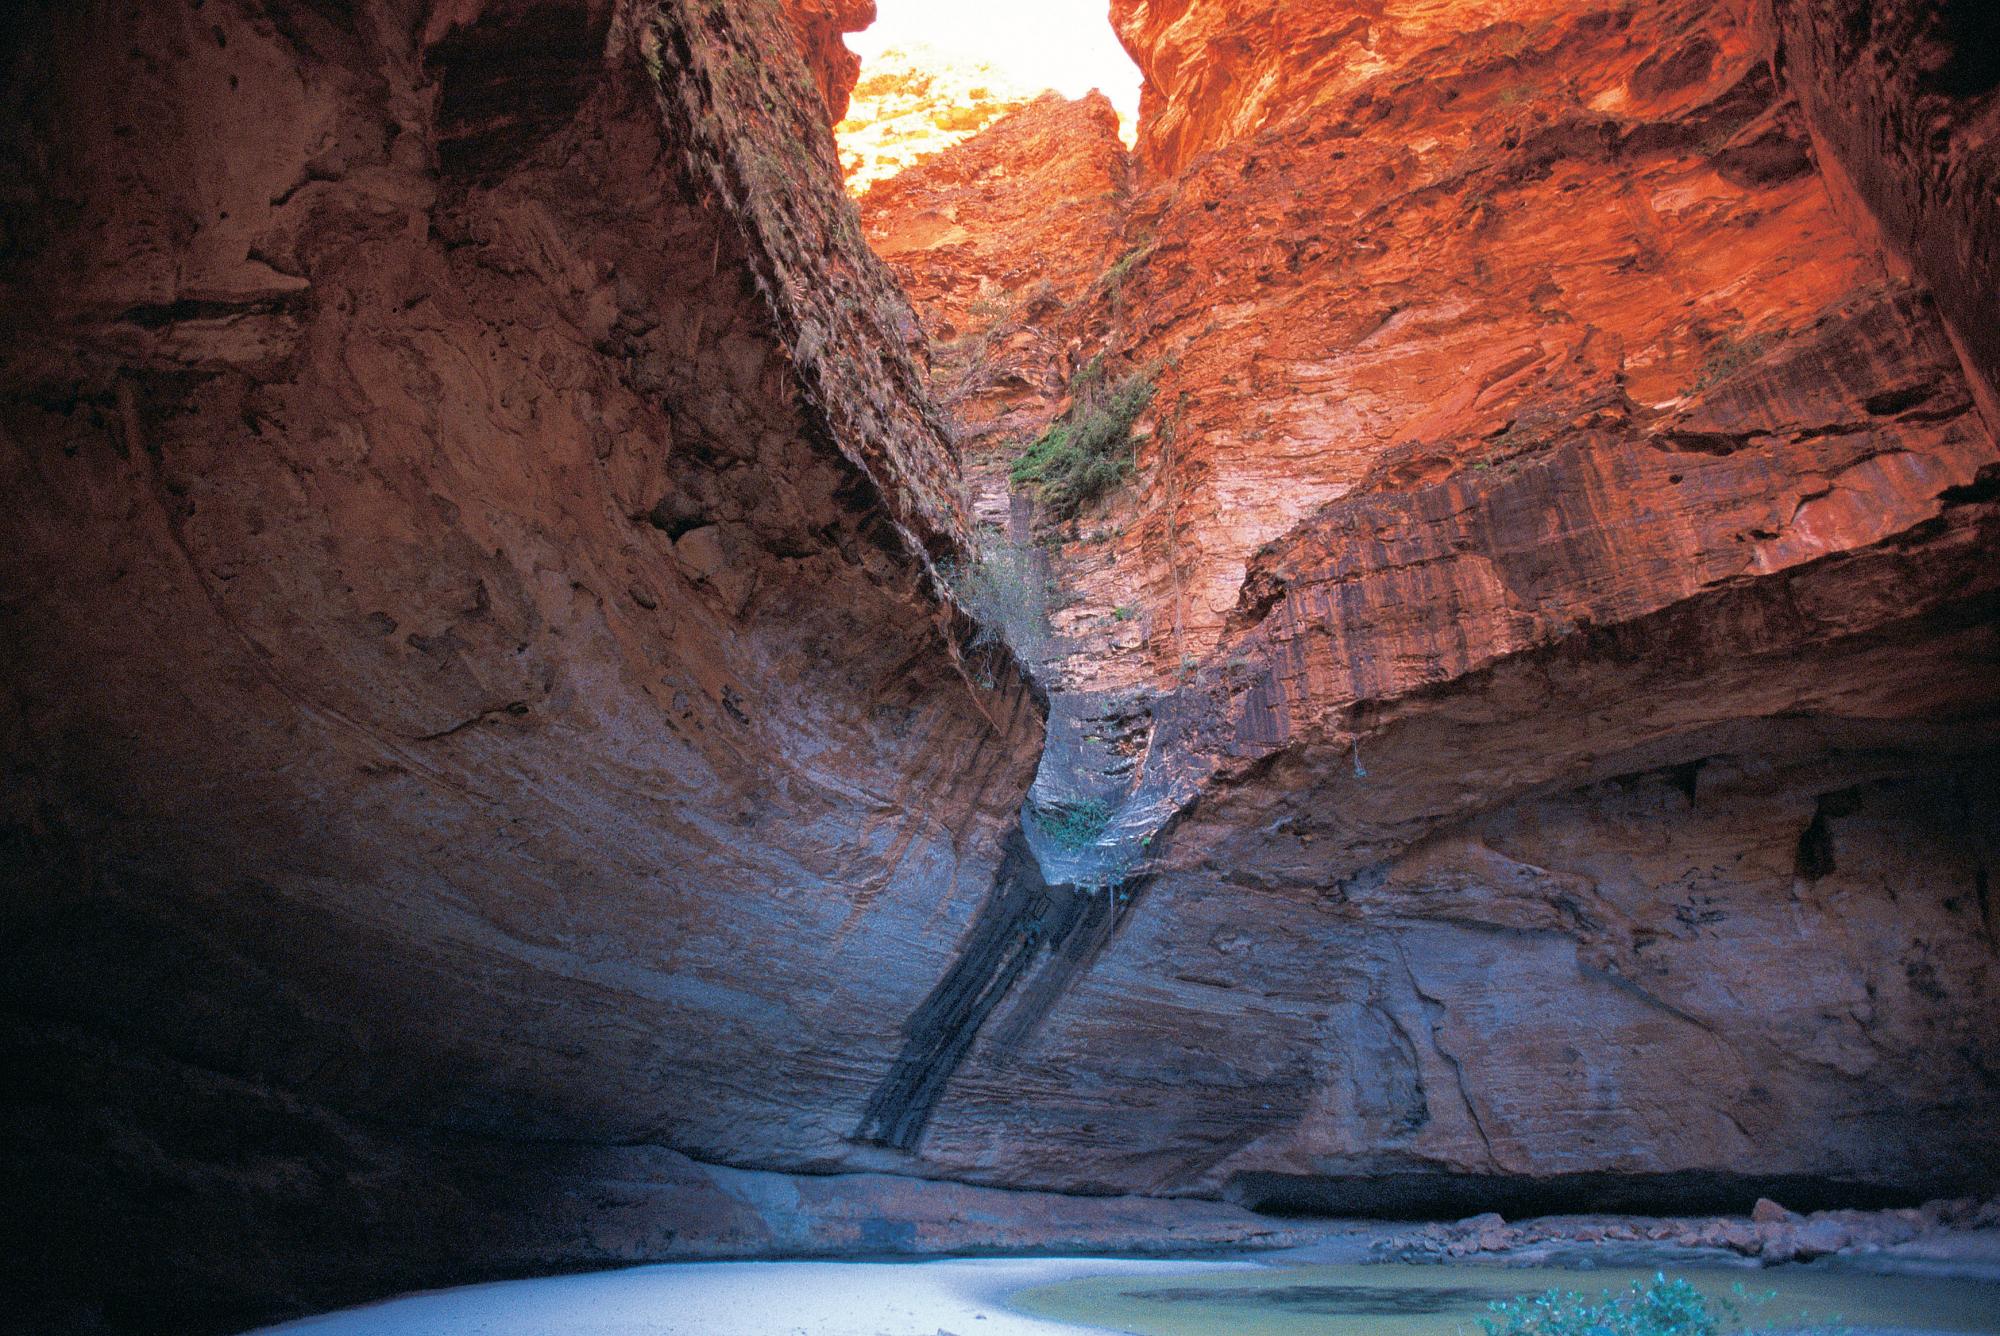 Kimberley Express   Cathedral Gorge, Bungle Bungle, Purnululu National Park, The Kimberley, North West, Western Australia